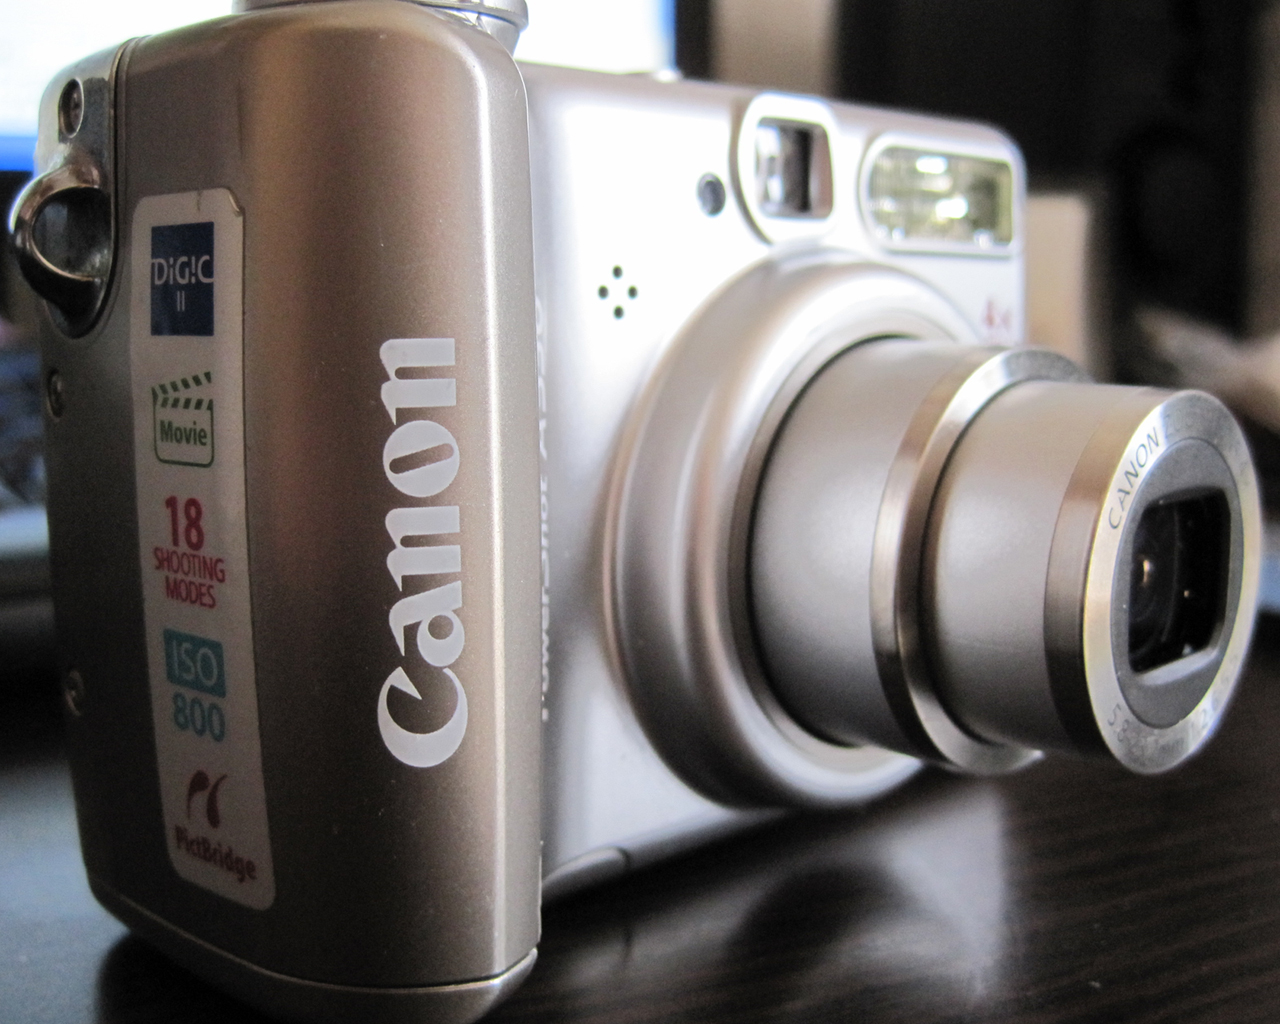 canon a530 a540 service manual good owner guide website u2022 rh hash ocean co Canon PowerShot A530 Canon A540